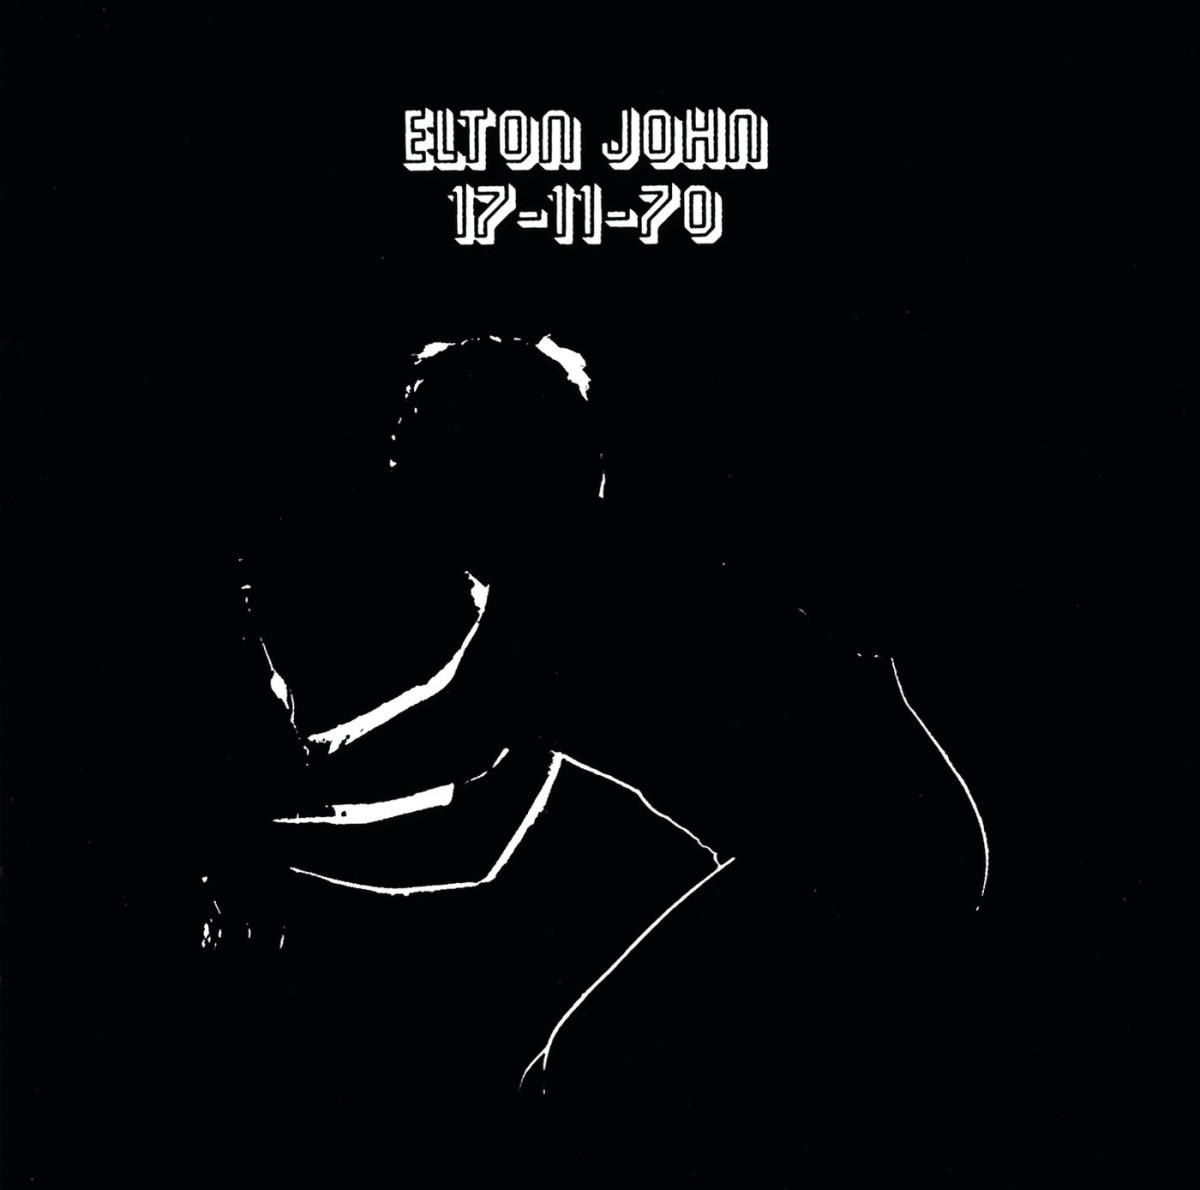 Elton John 111770